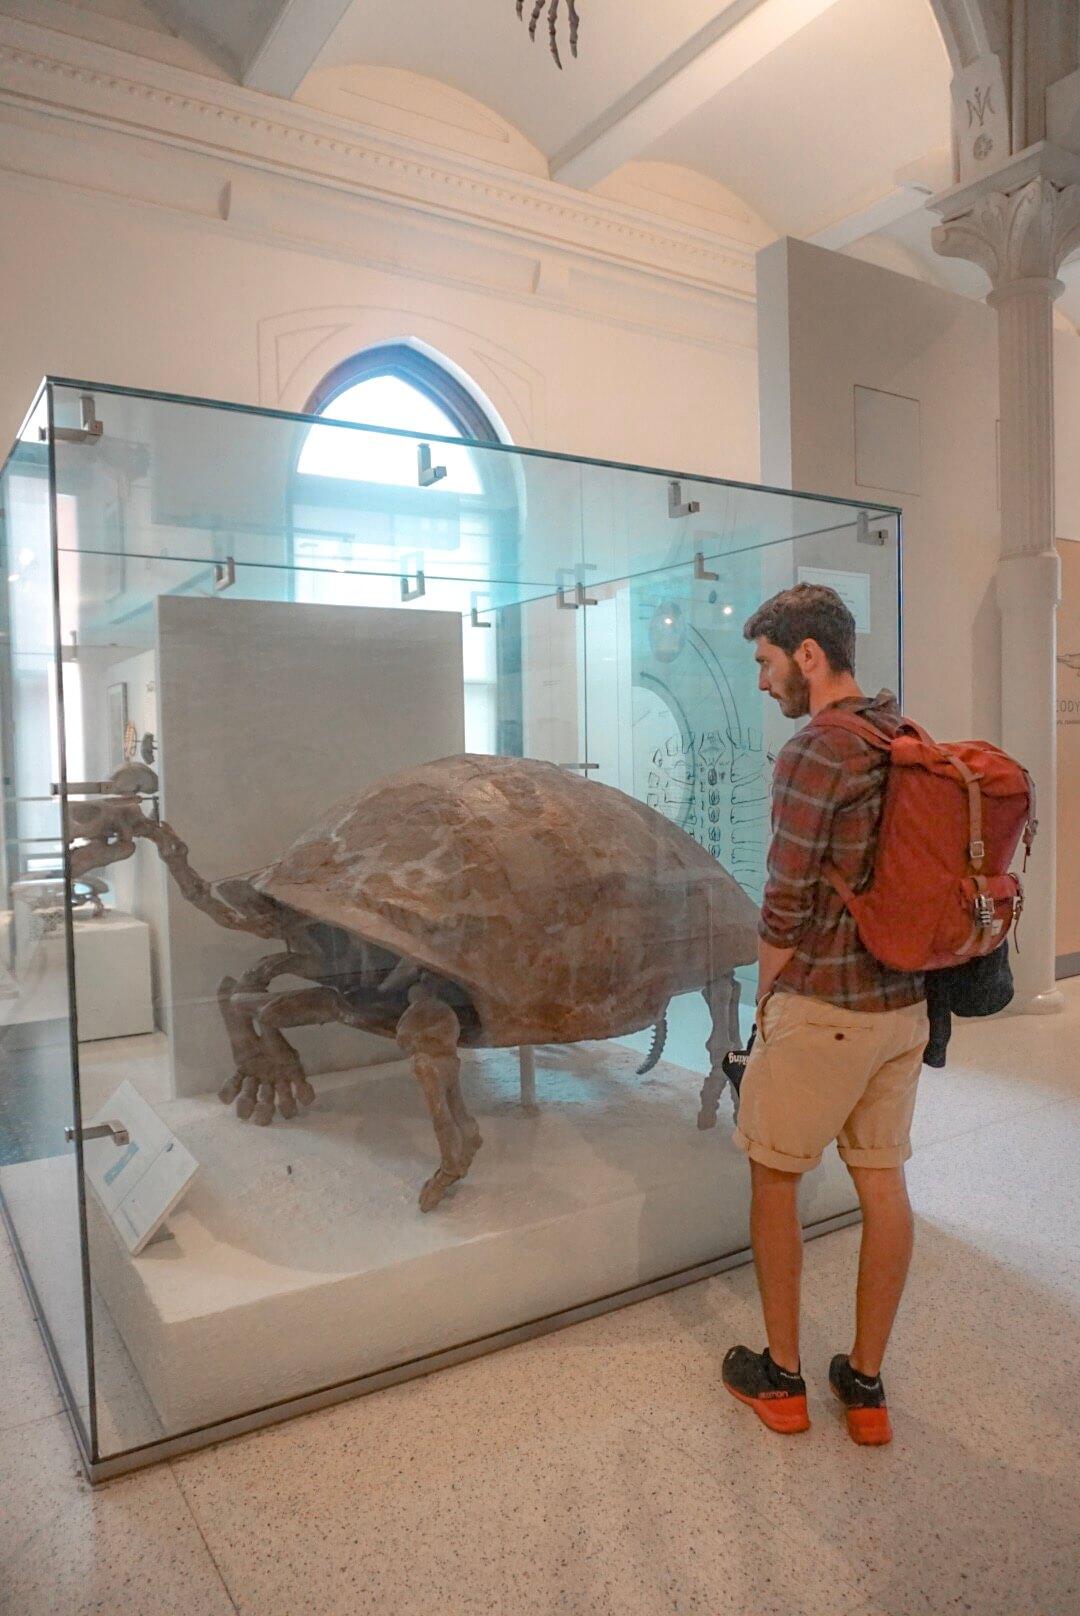 visiter musée d'histoire naturelle new york